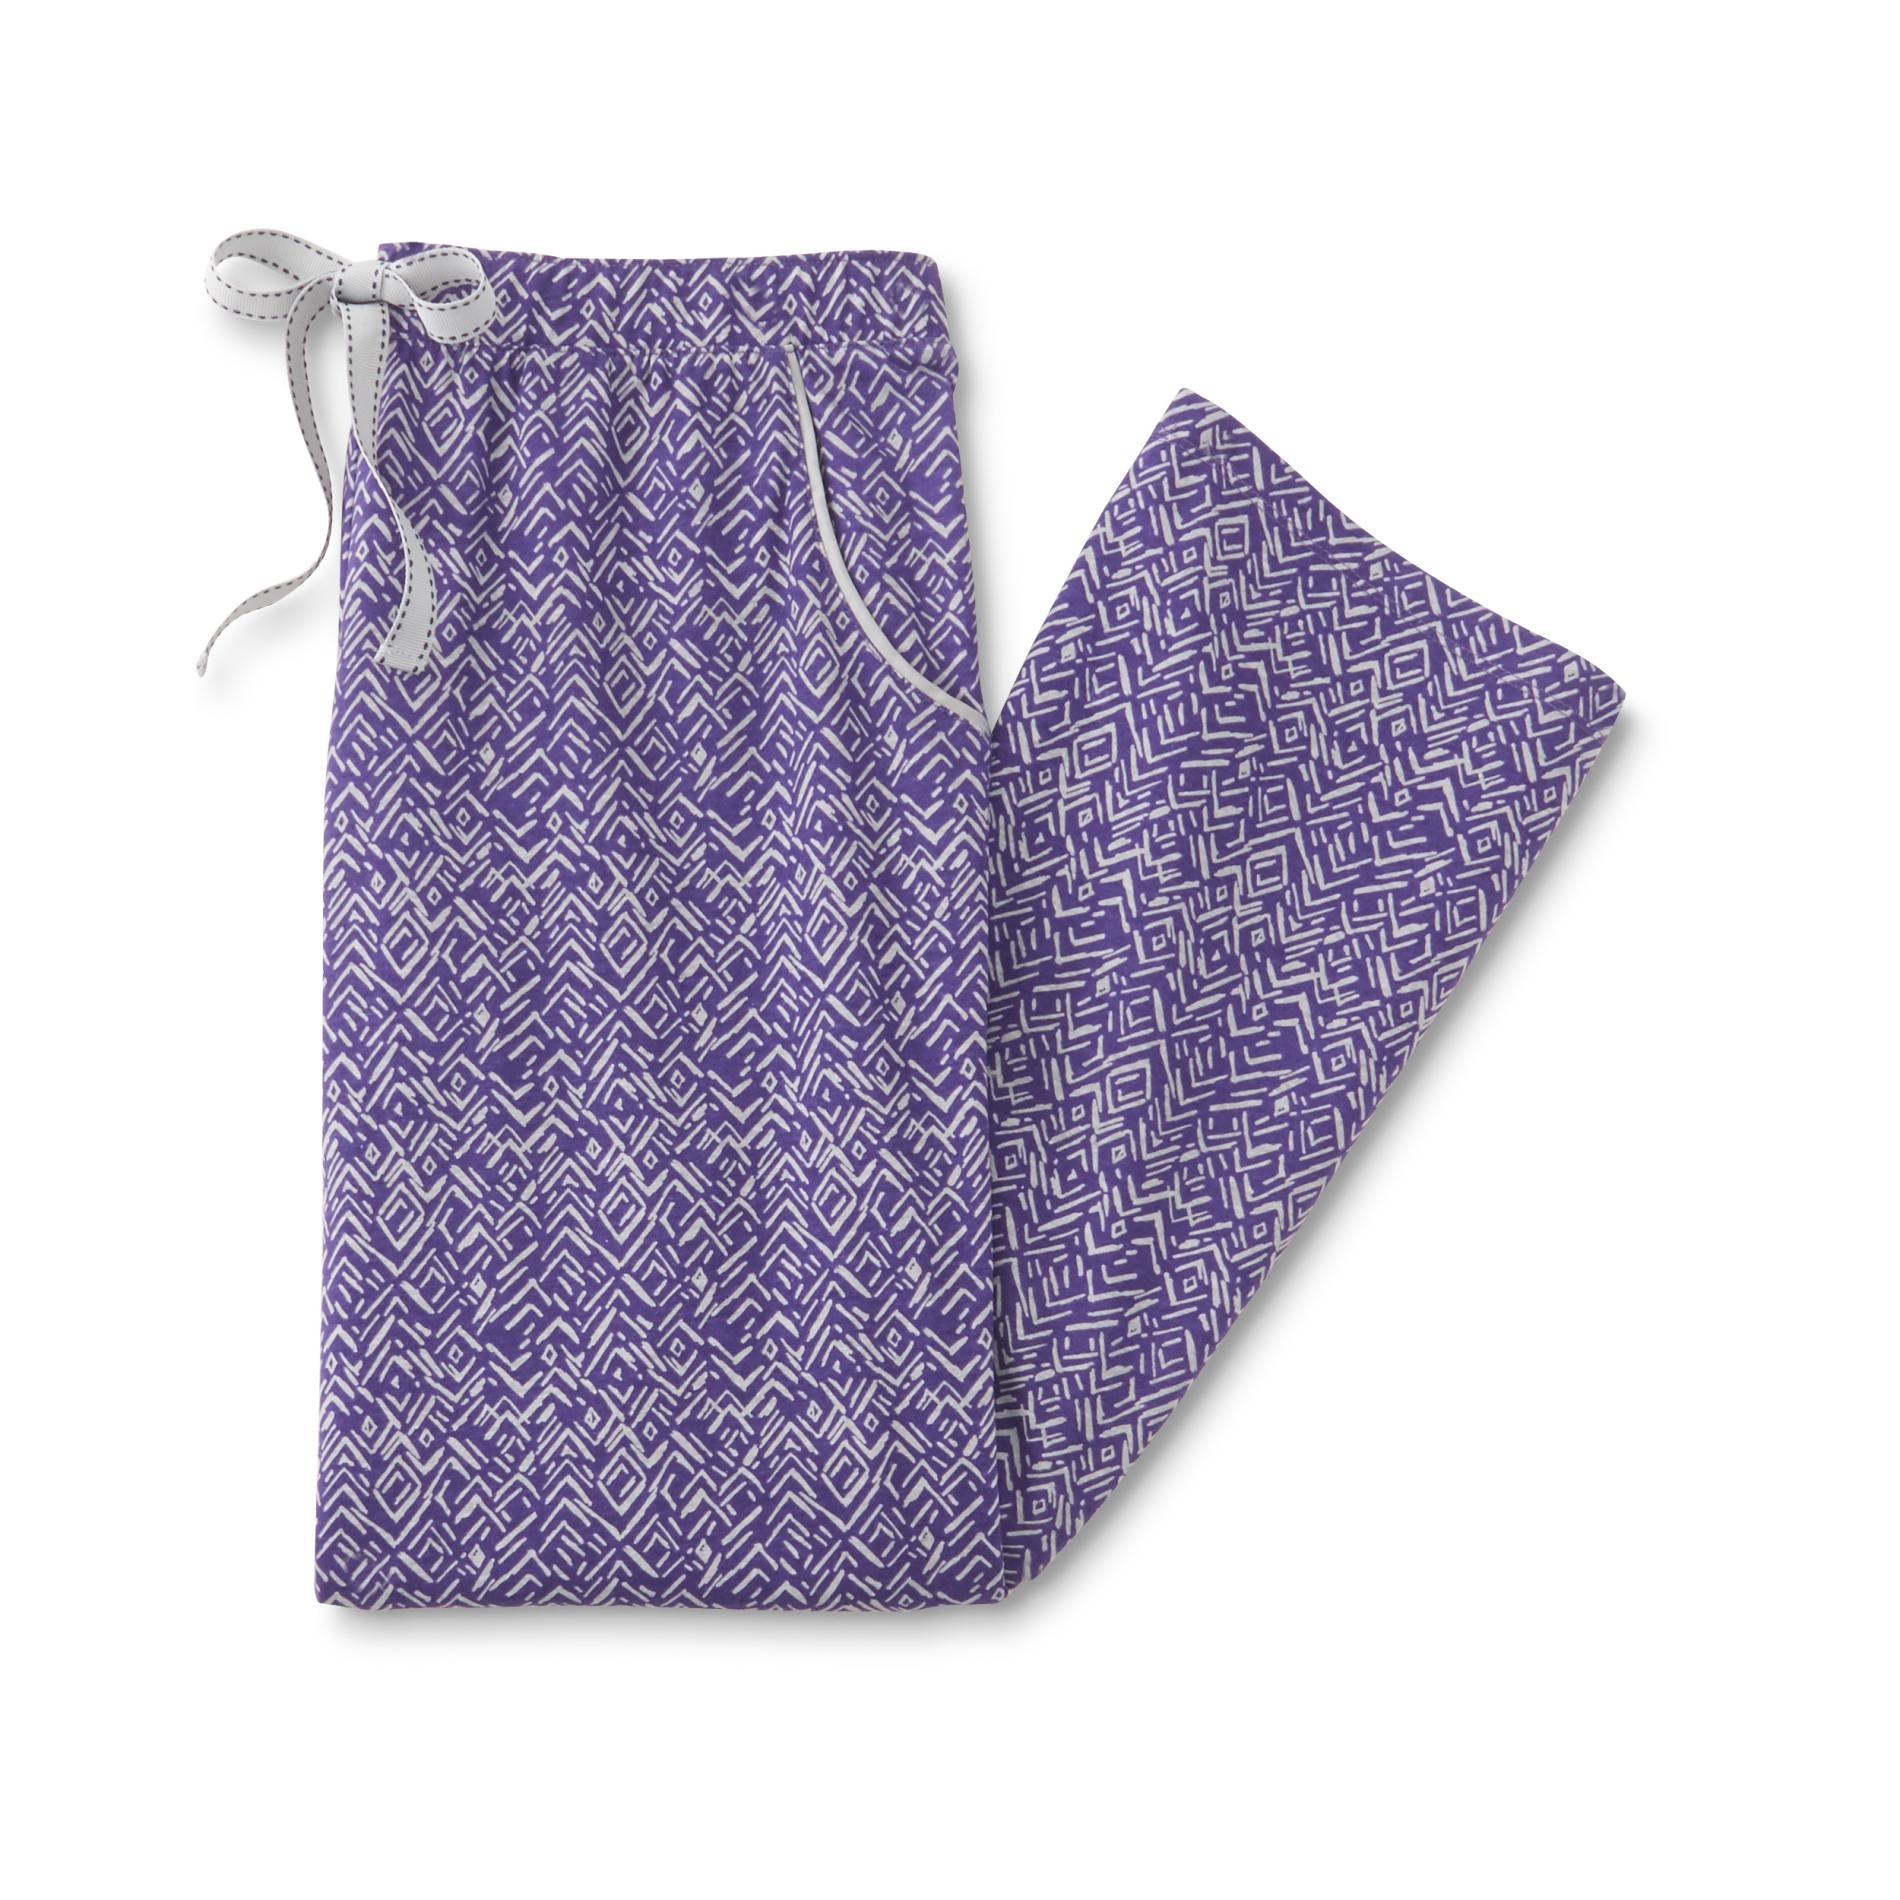 Covington Women's Pajama Pants - Herringbone